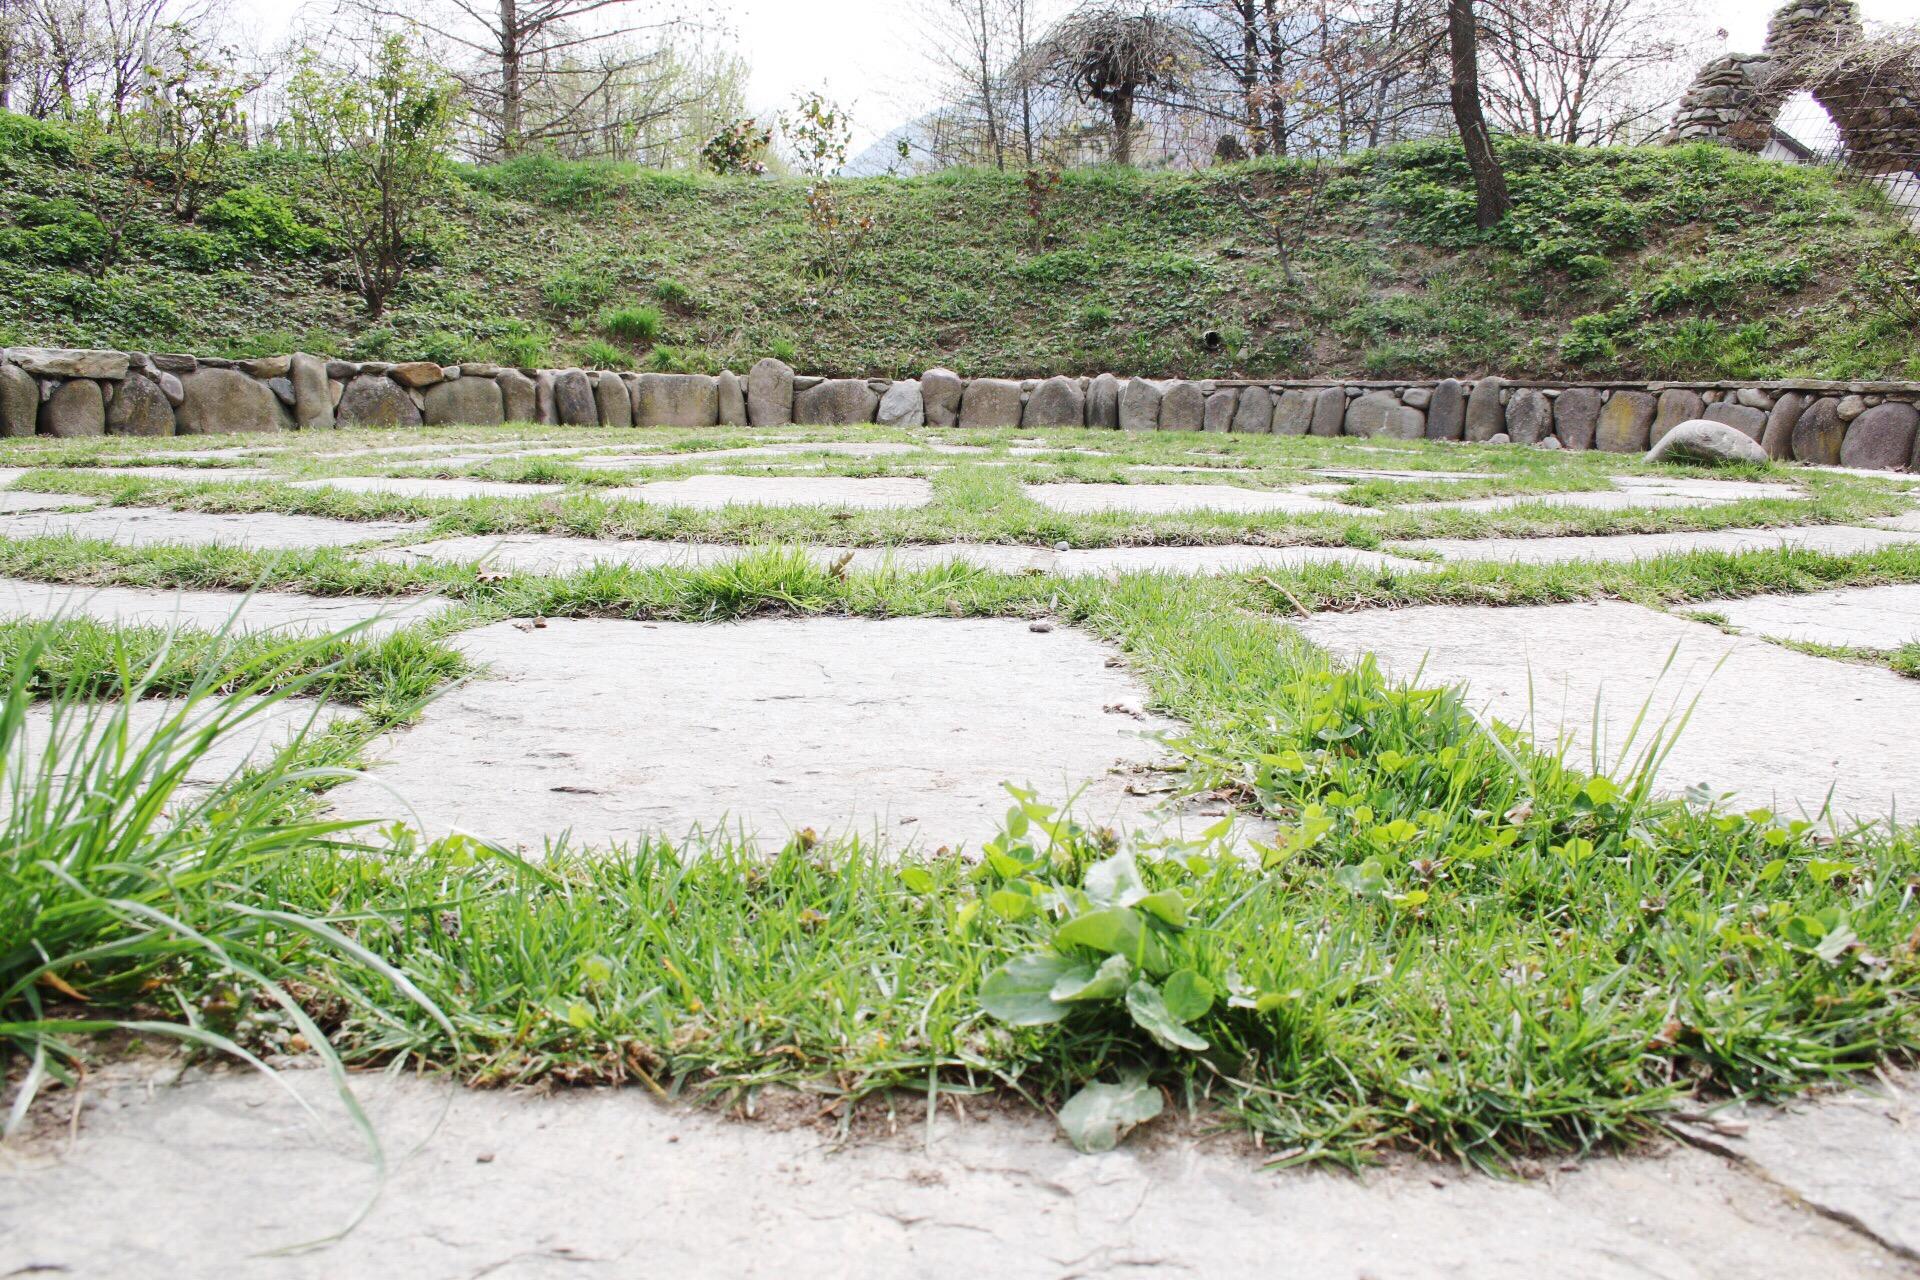 Giardino labirinto tenuta kranzel alto adige theoldnow for Giardino labirinto